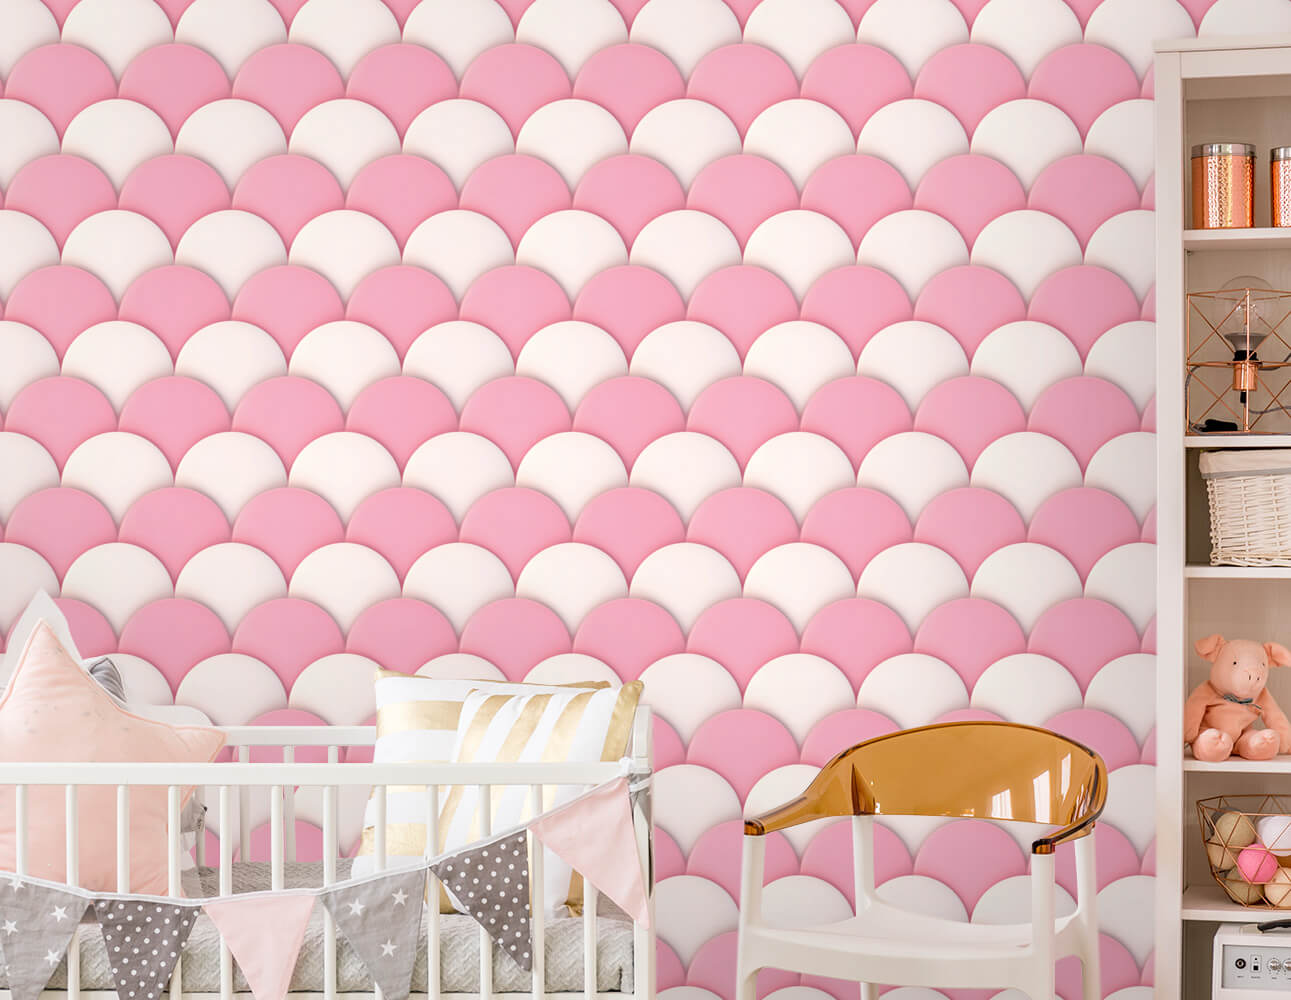 Papel de Parede Infantil - Escamas Rosa e Branco